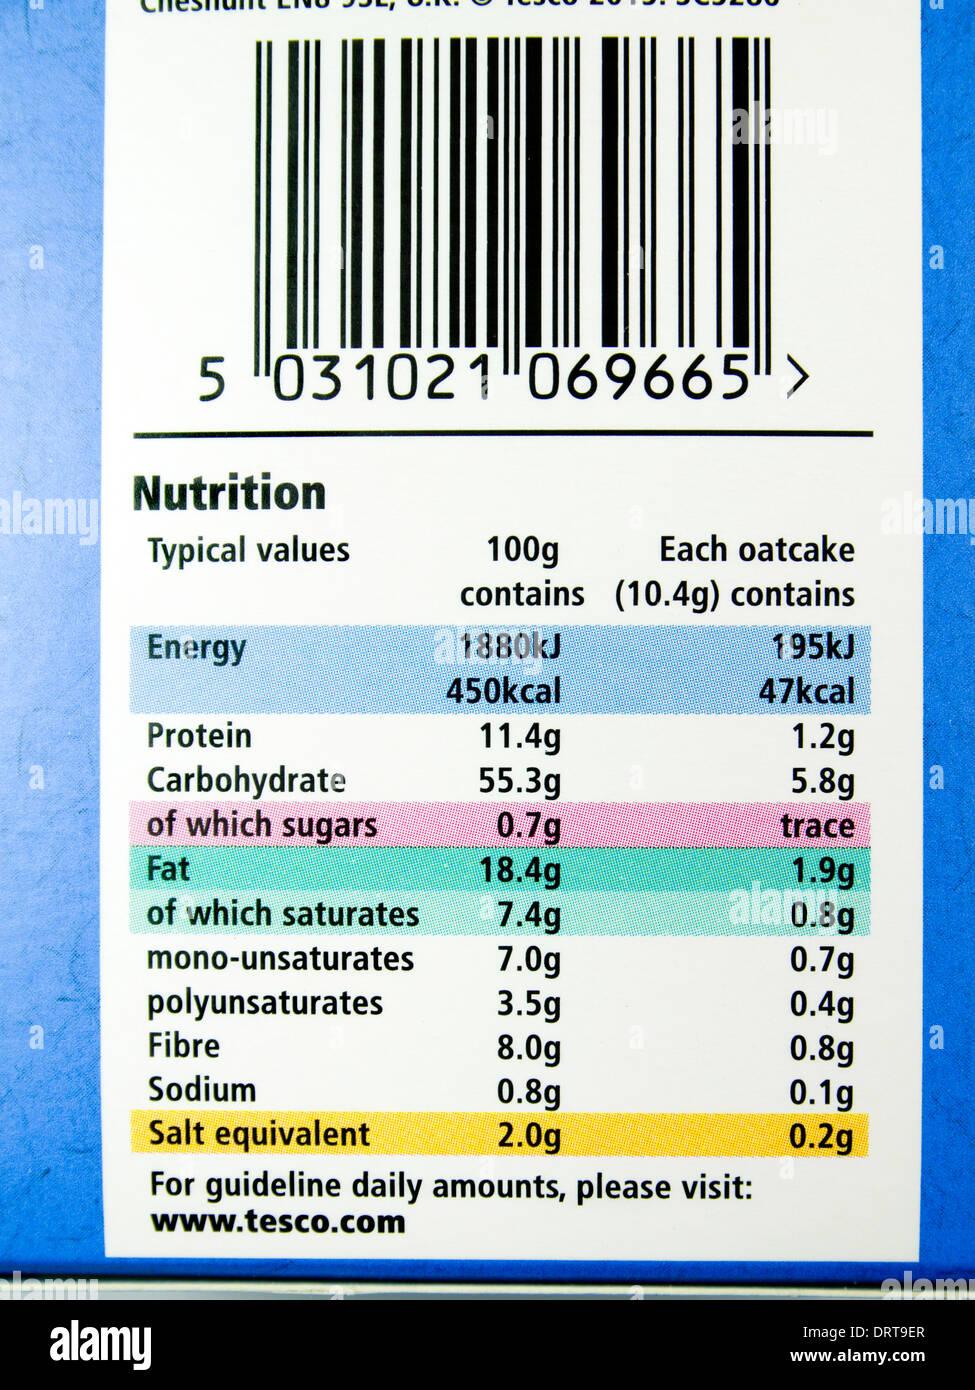 Nutritional information food label. - Stock Image